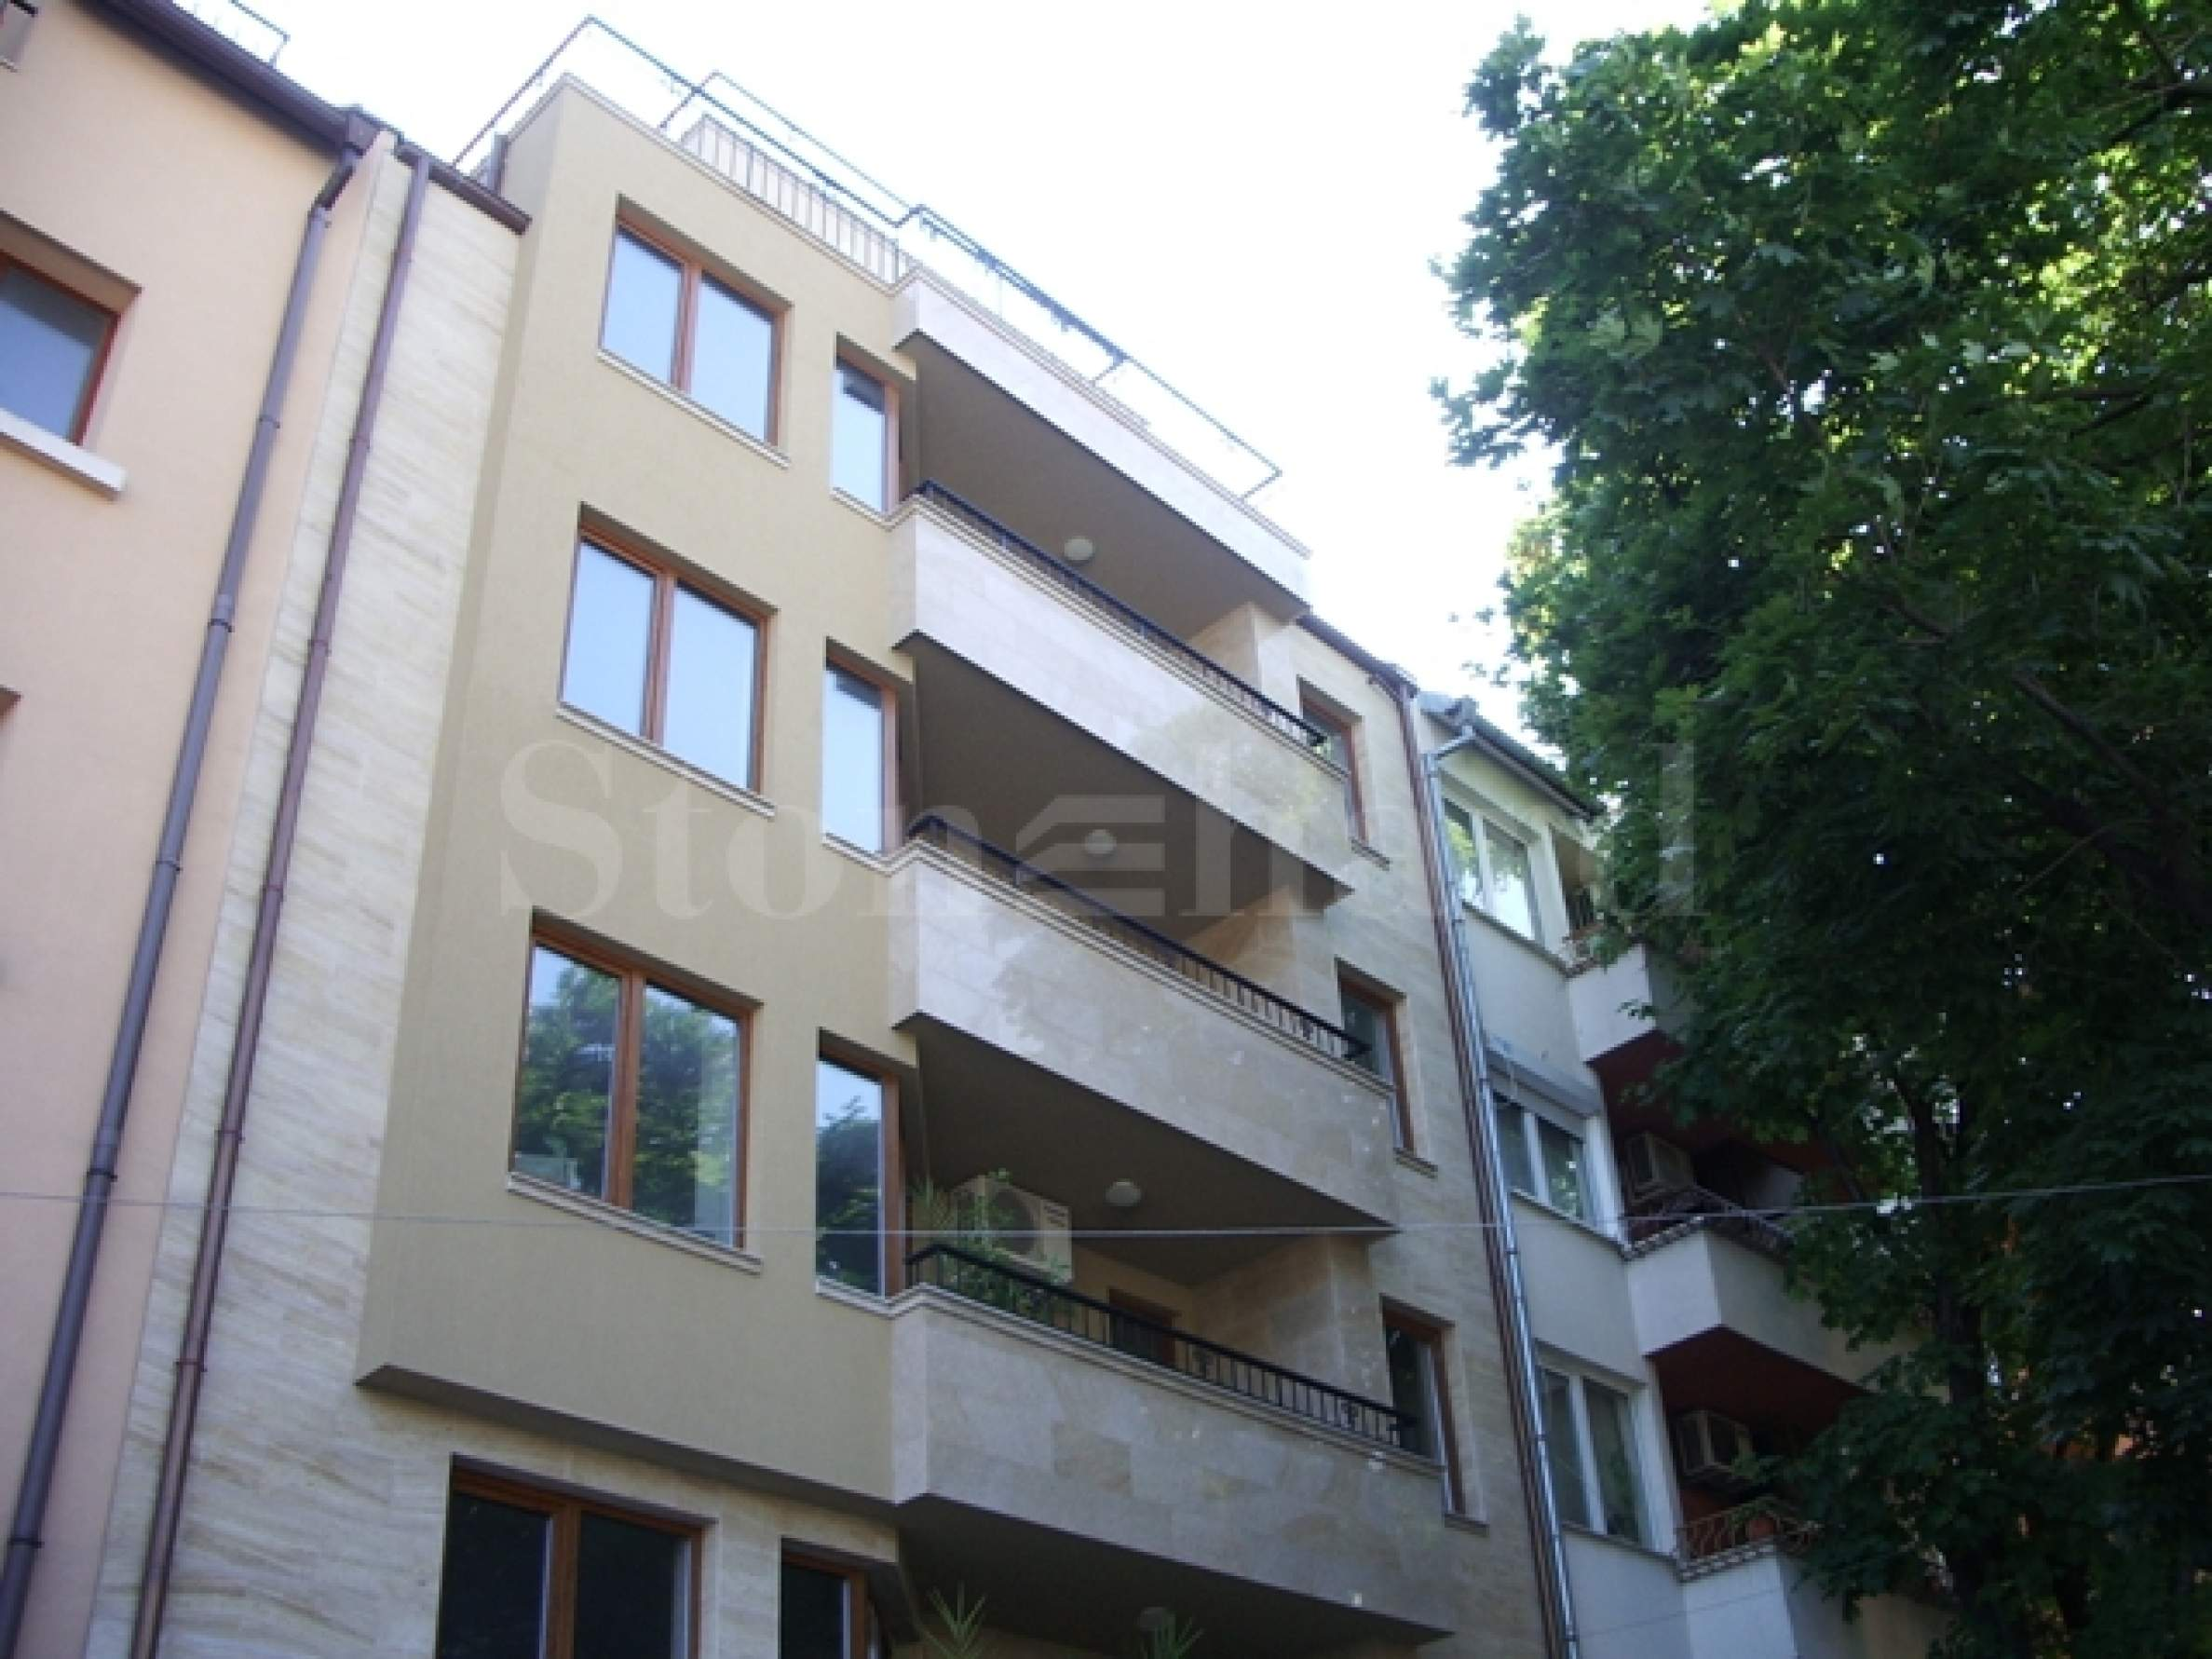 Апартаменти и офис в стилна сграда2 - Stonehard